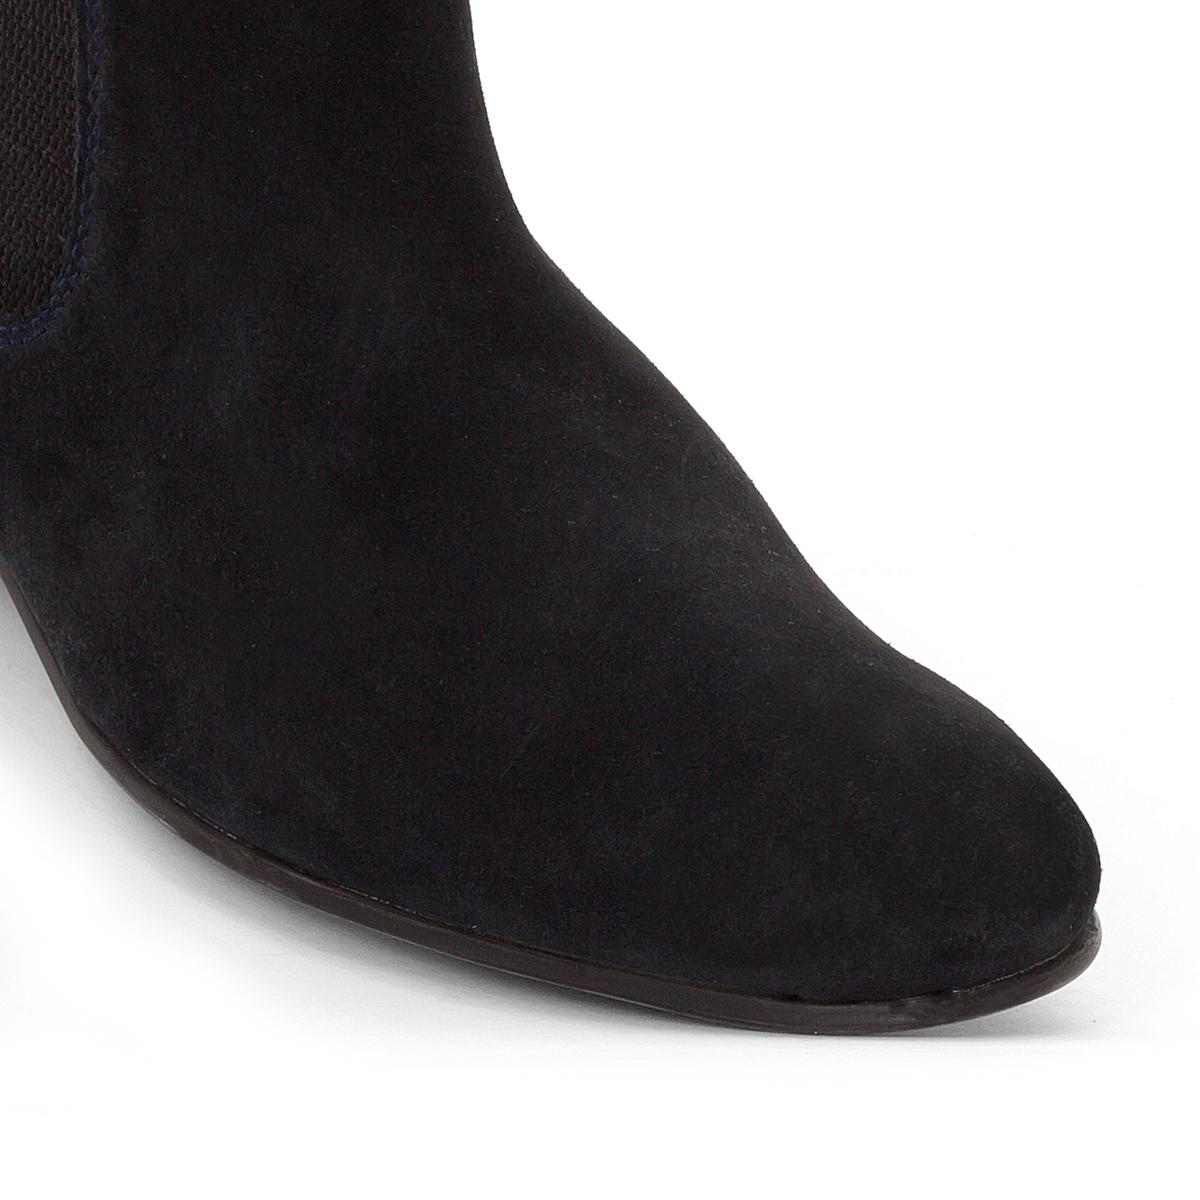 Ботинки-челси BrokerВерх / Голенище : кожа.   Подкладка : кожа.   Стелька : кожа.   Подошва : Каучук   Застежка : без застежки<br><br>Цвет: темно-синий